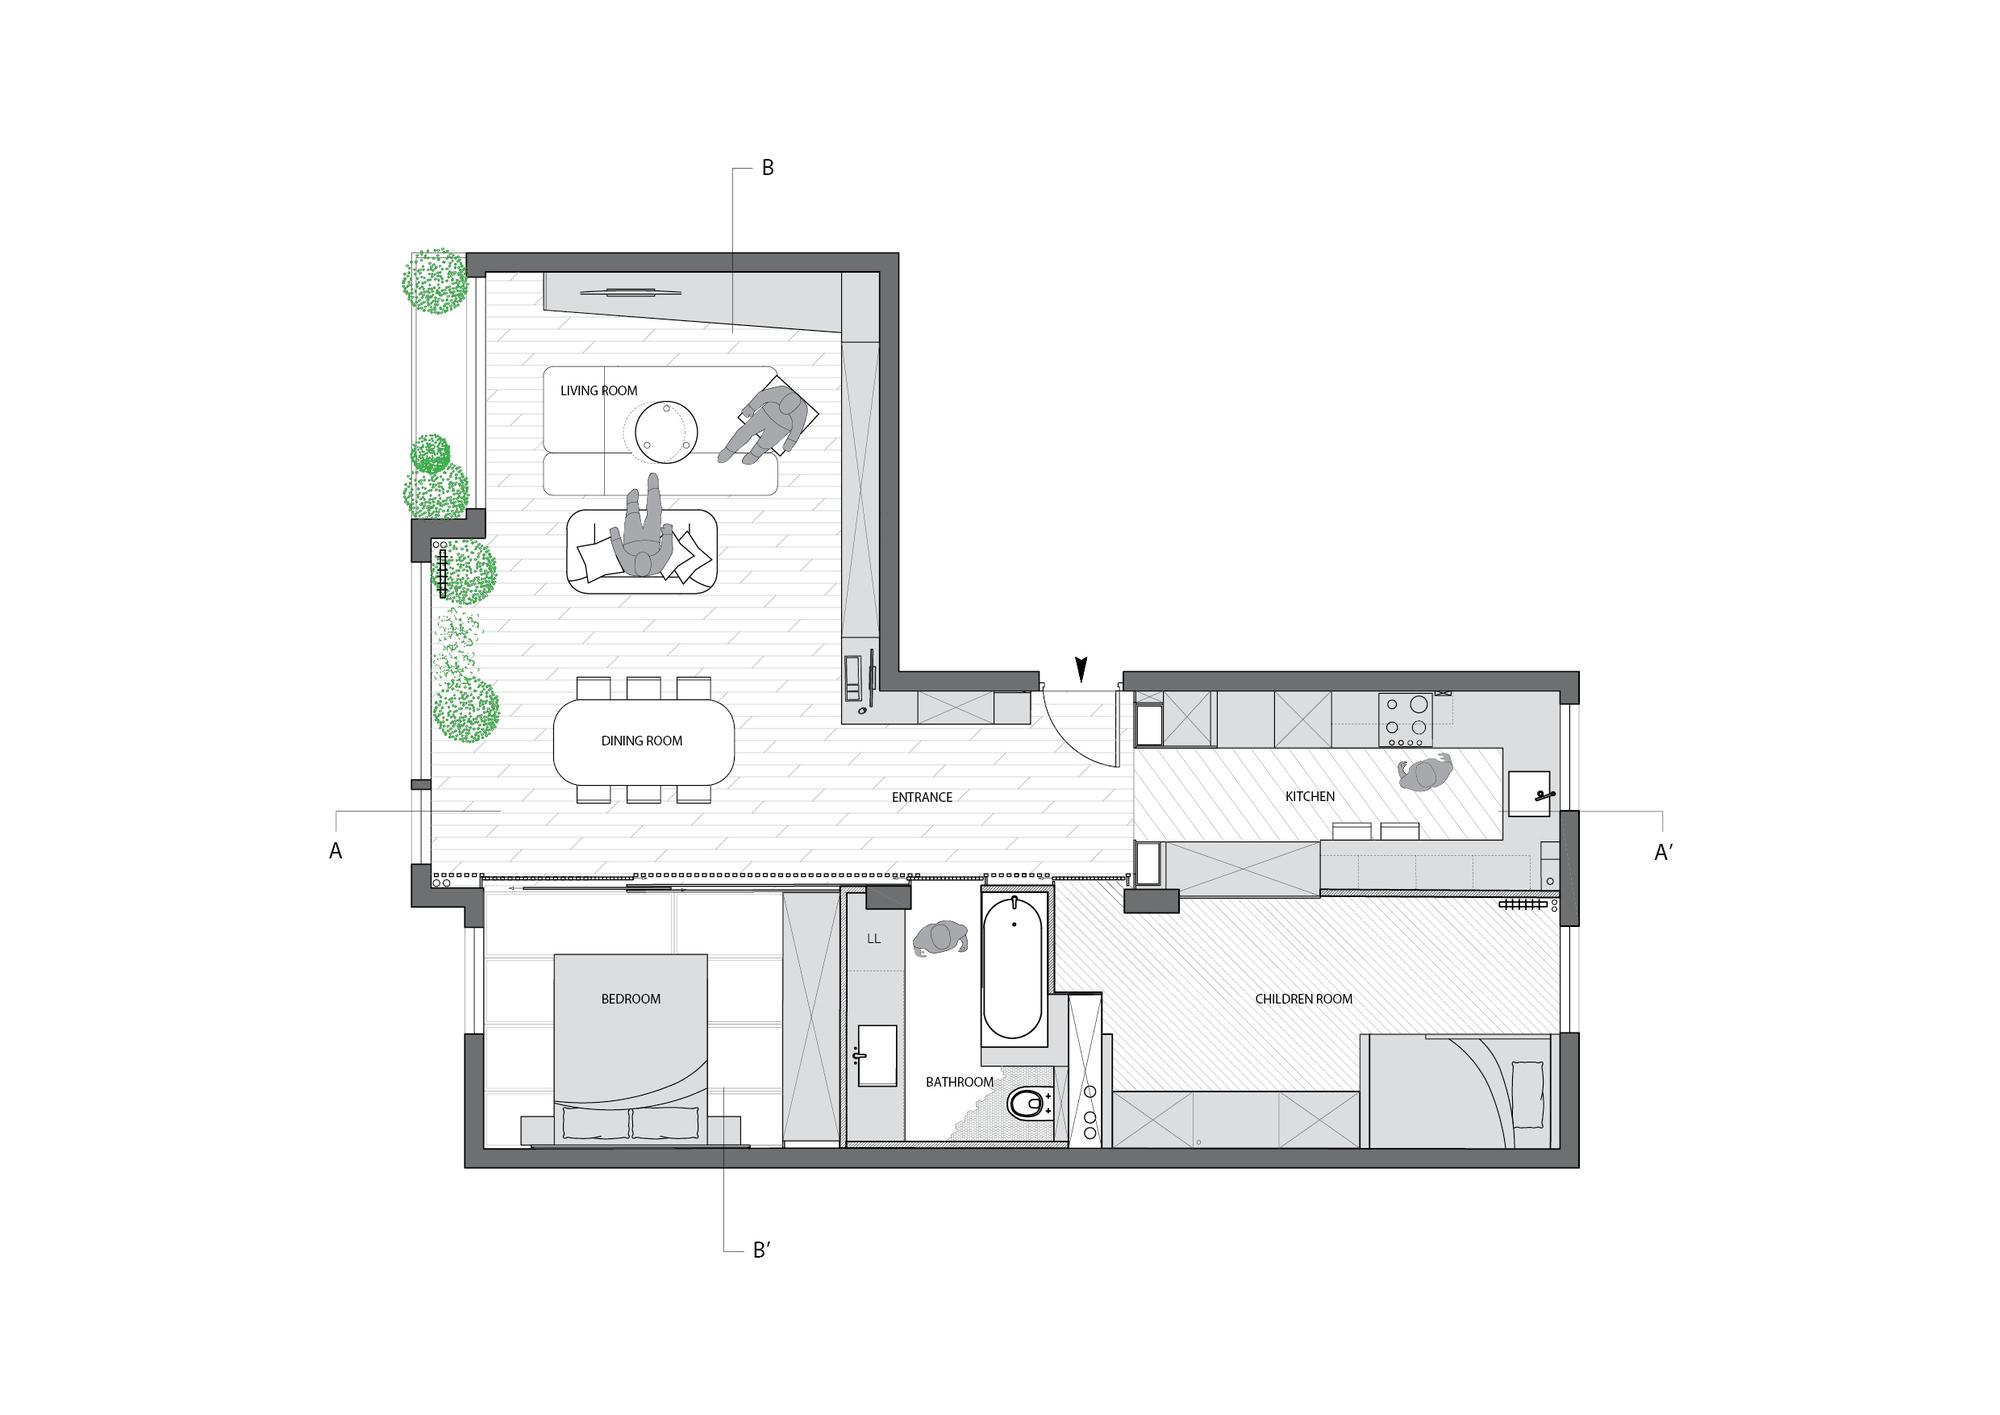 galeria de buttes chaumont glenn medioni 23. Black Bedroom Furniture Sets. Home Design Ideas